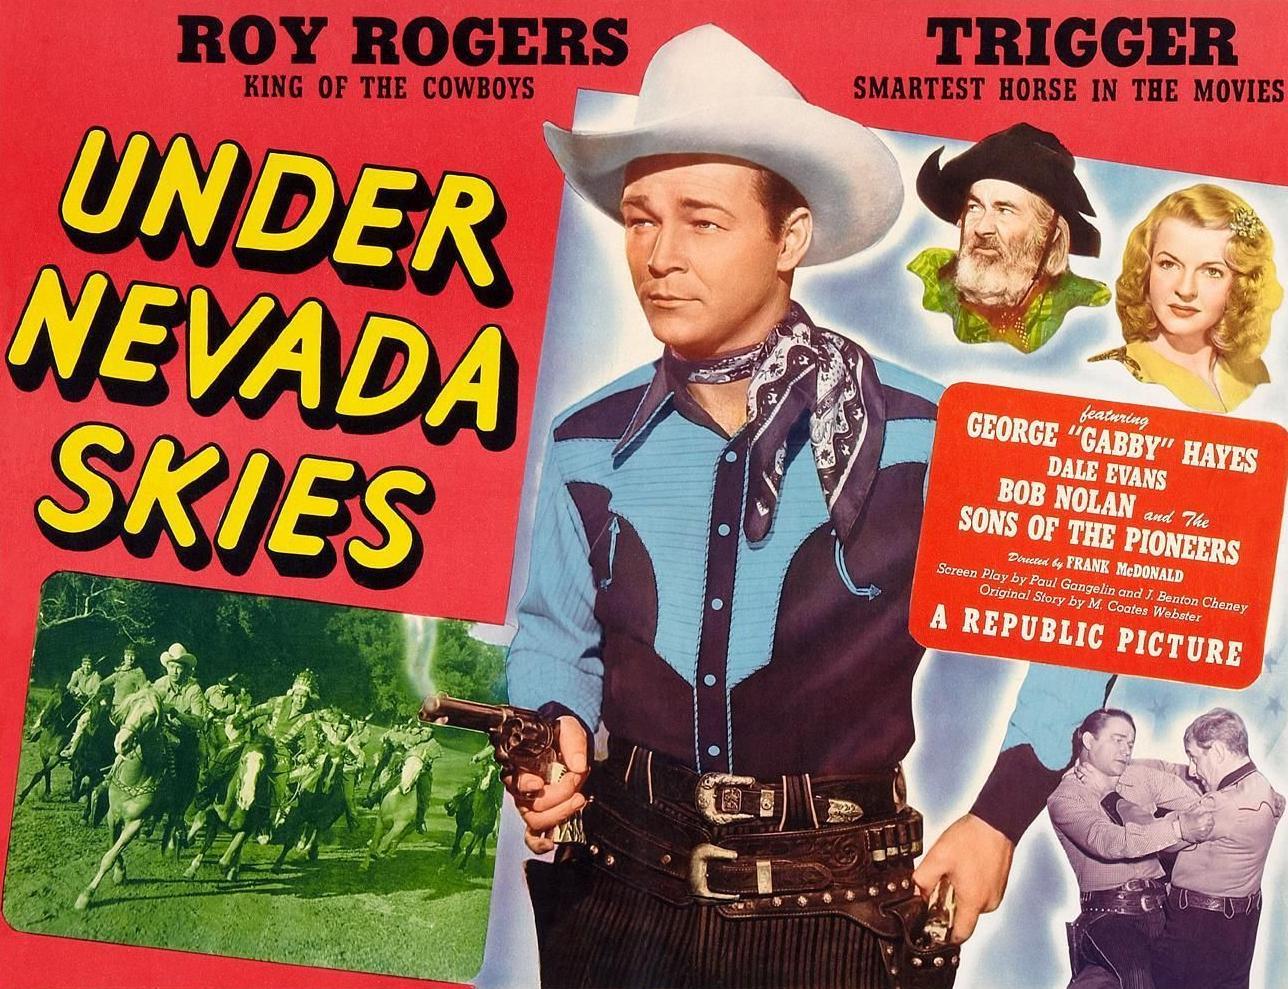 Roy Rogers, Dale Evans, and George 'Gabby' Hayes in Under Nevada Skies (1946)